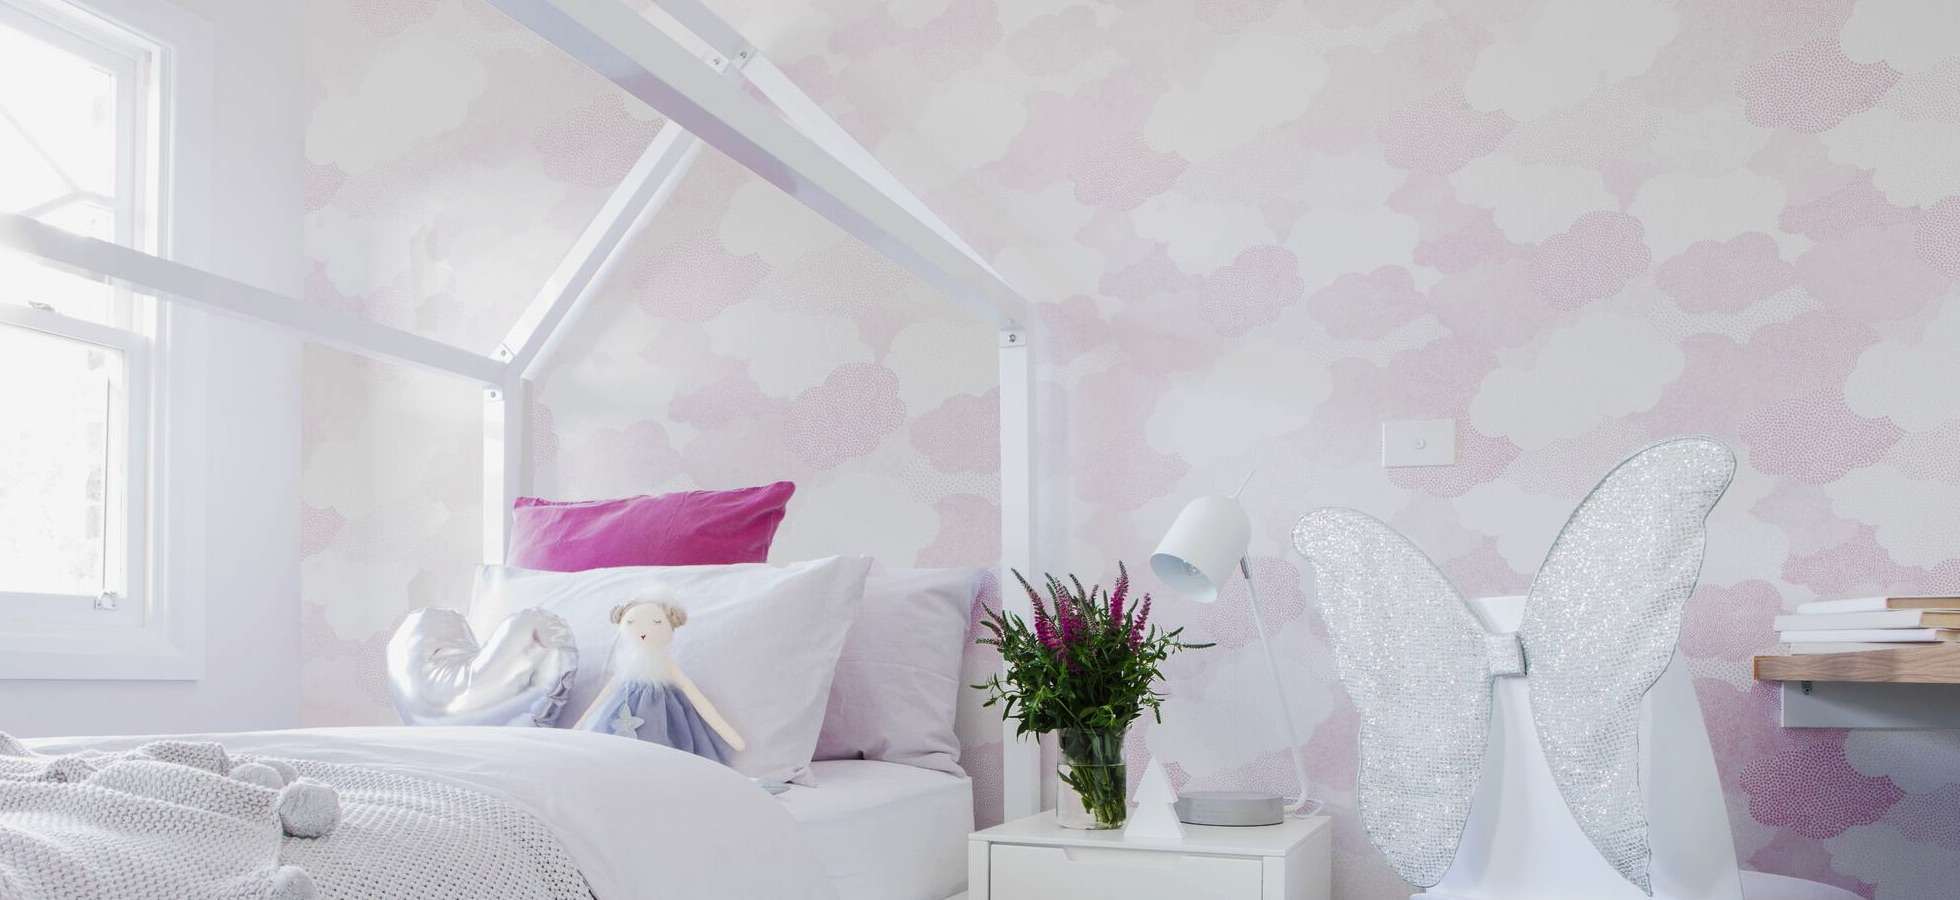 Must see Wallpaper Marble Mint Green - clouds_main  Trends_557511.jpg?t\u003d1527754540